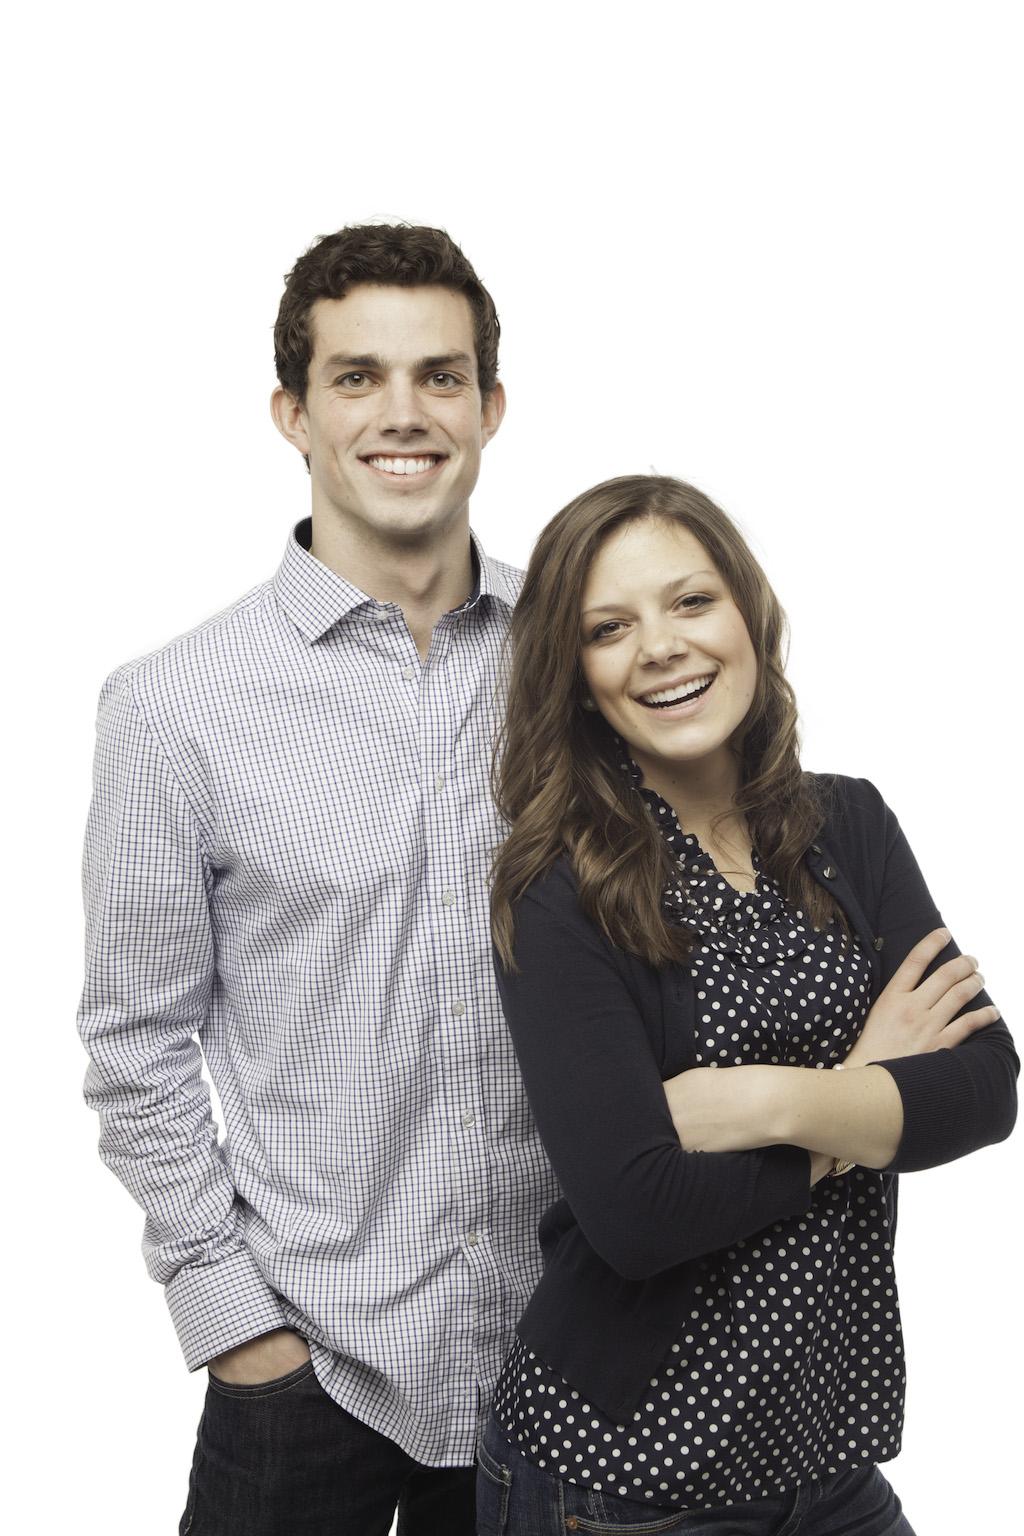 Brandon Beck and Erika Nash are running for BYU/SA president and vice president.